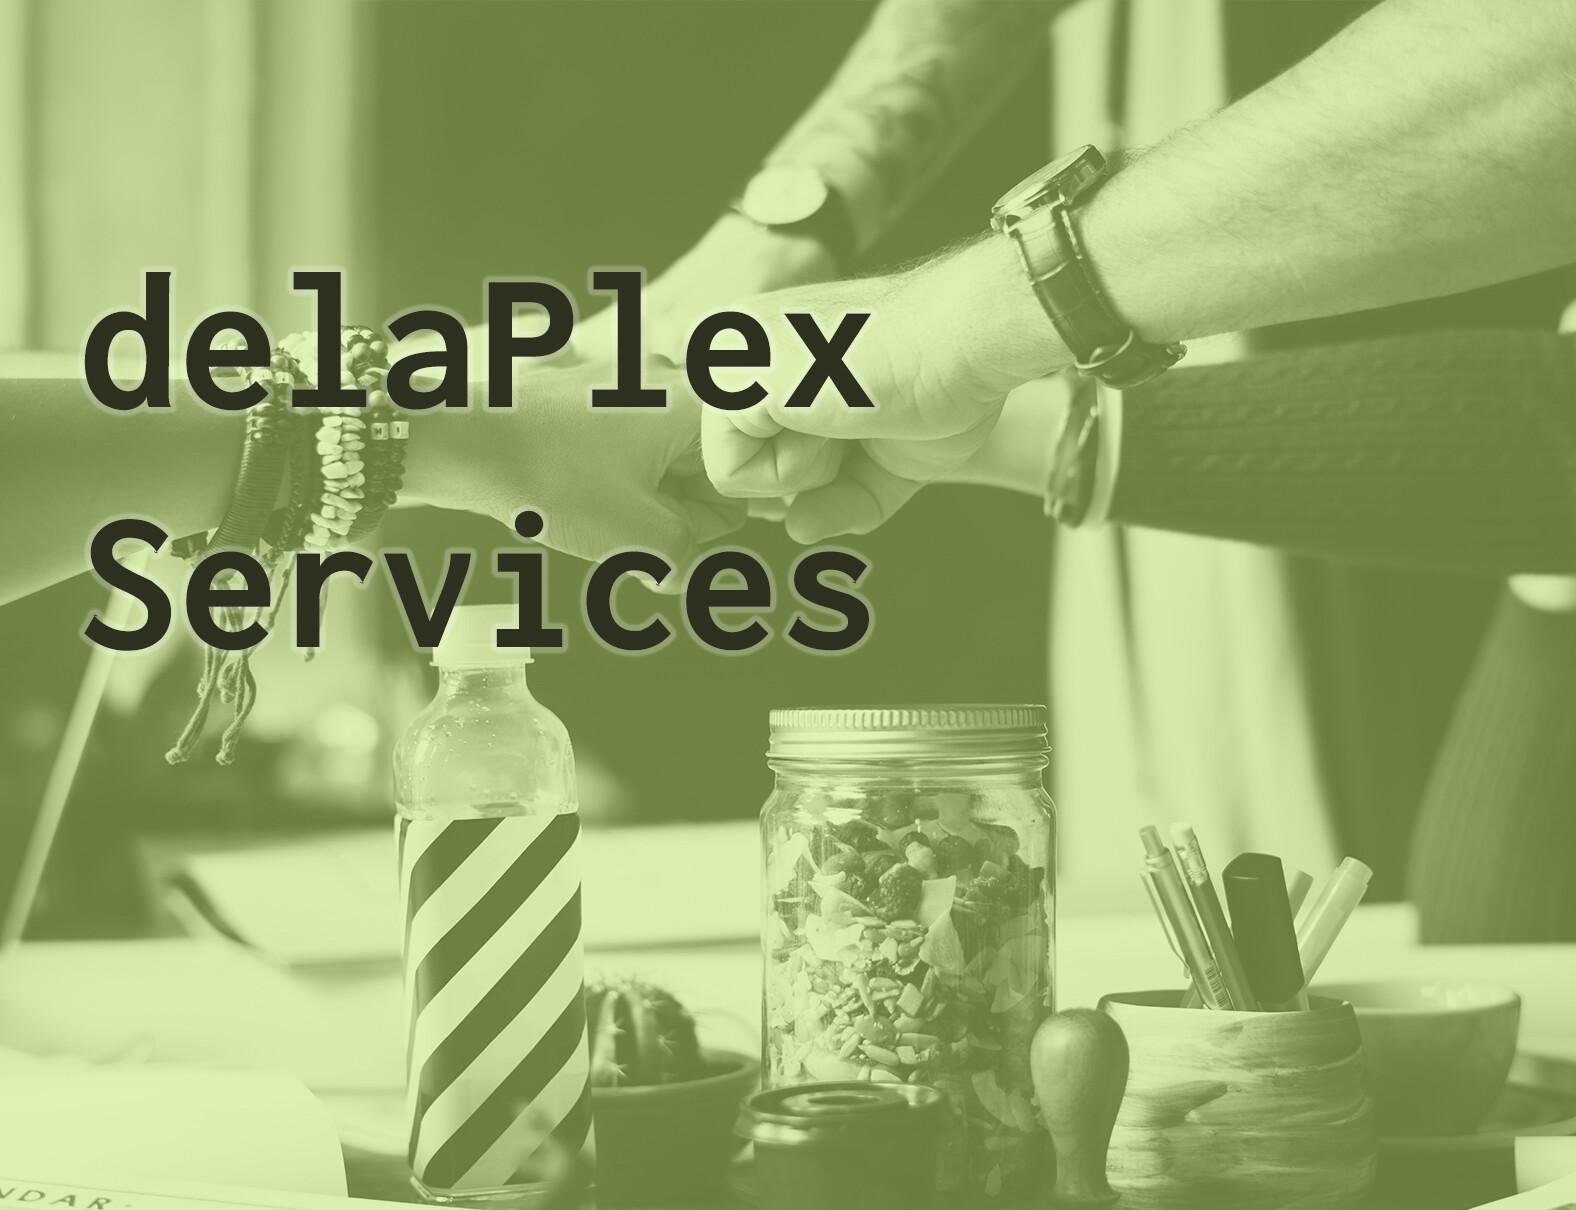 delaPlex Services Brochure